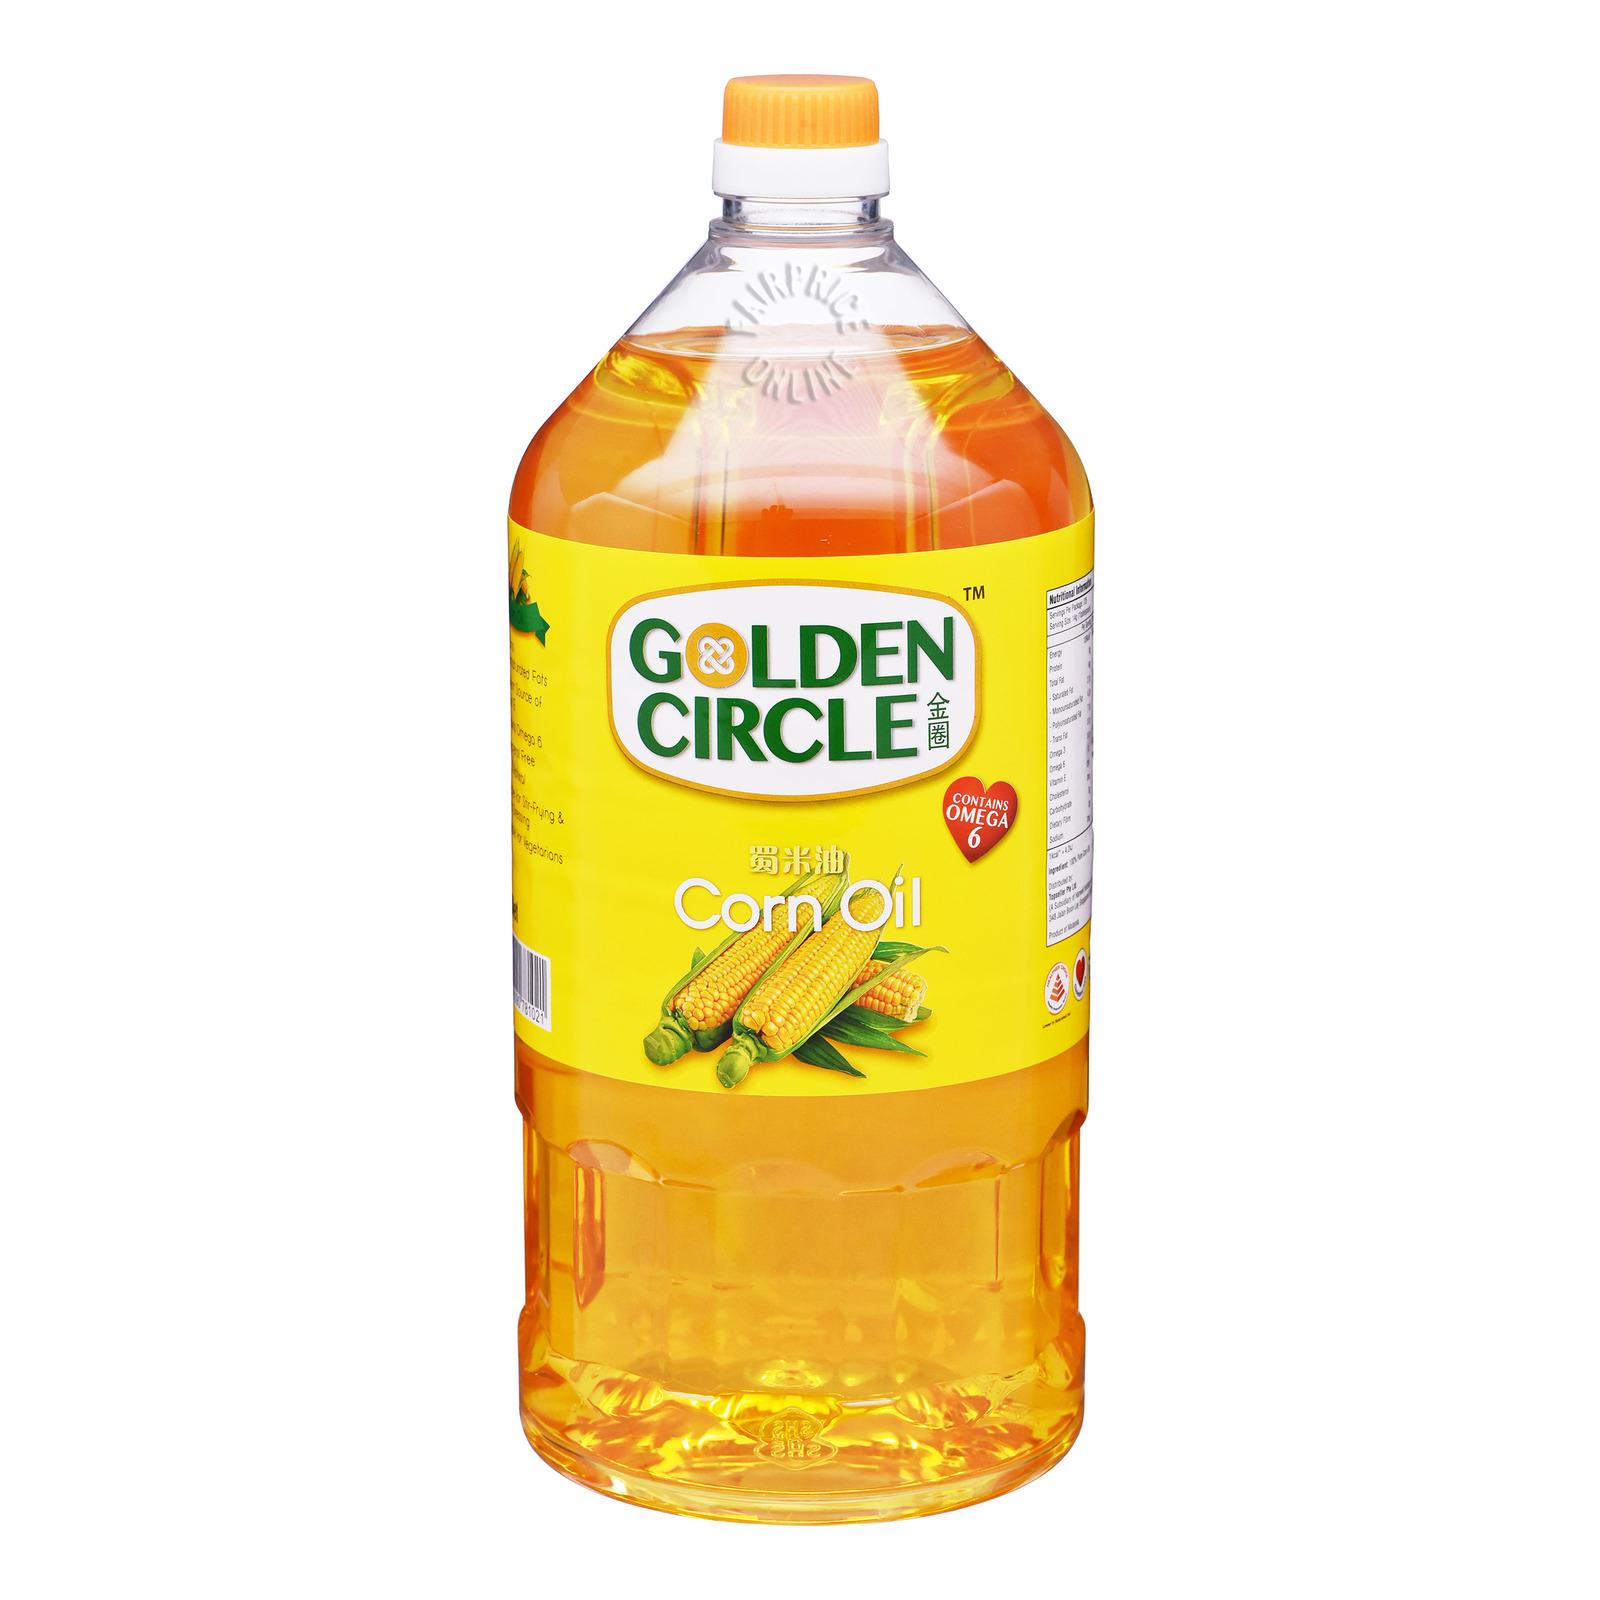 Golden Circle Corn Oil